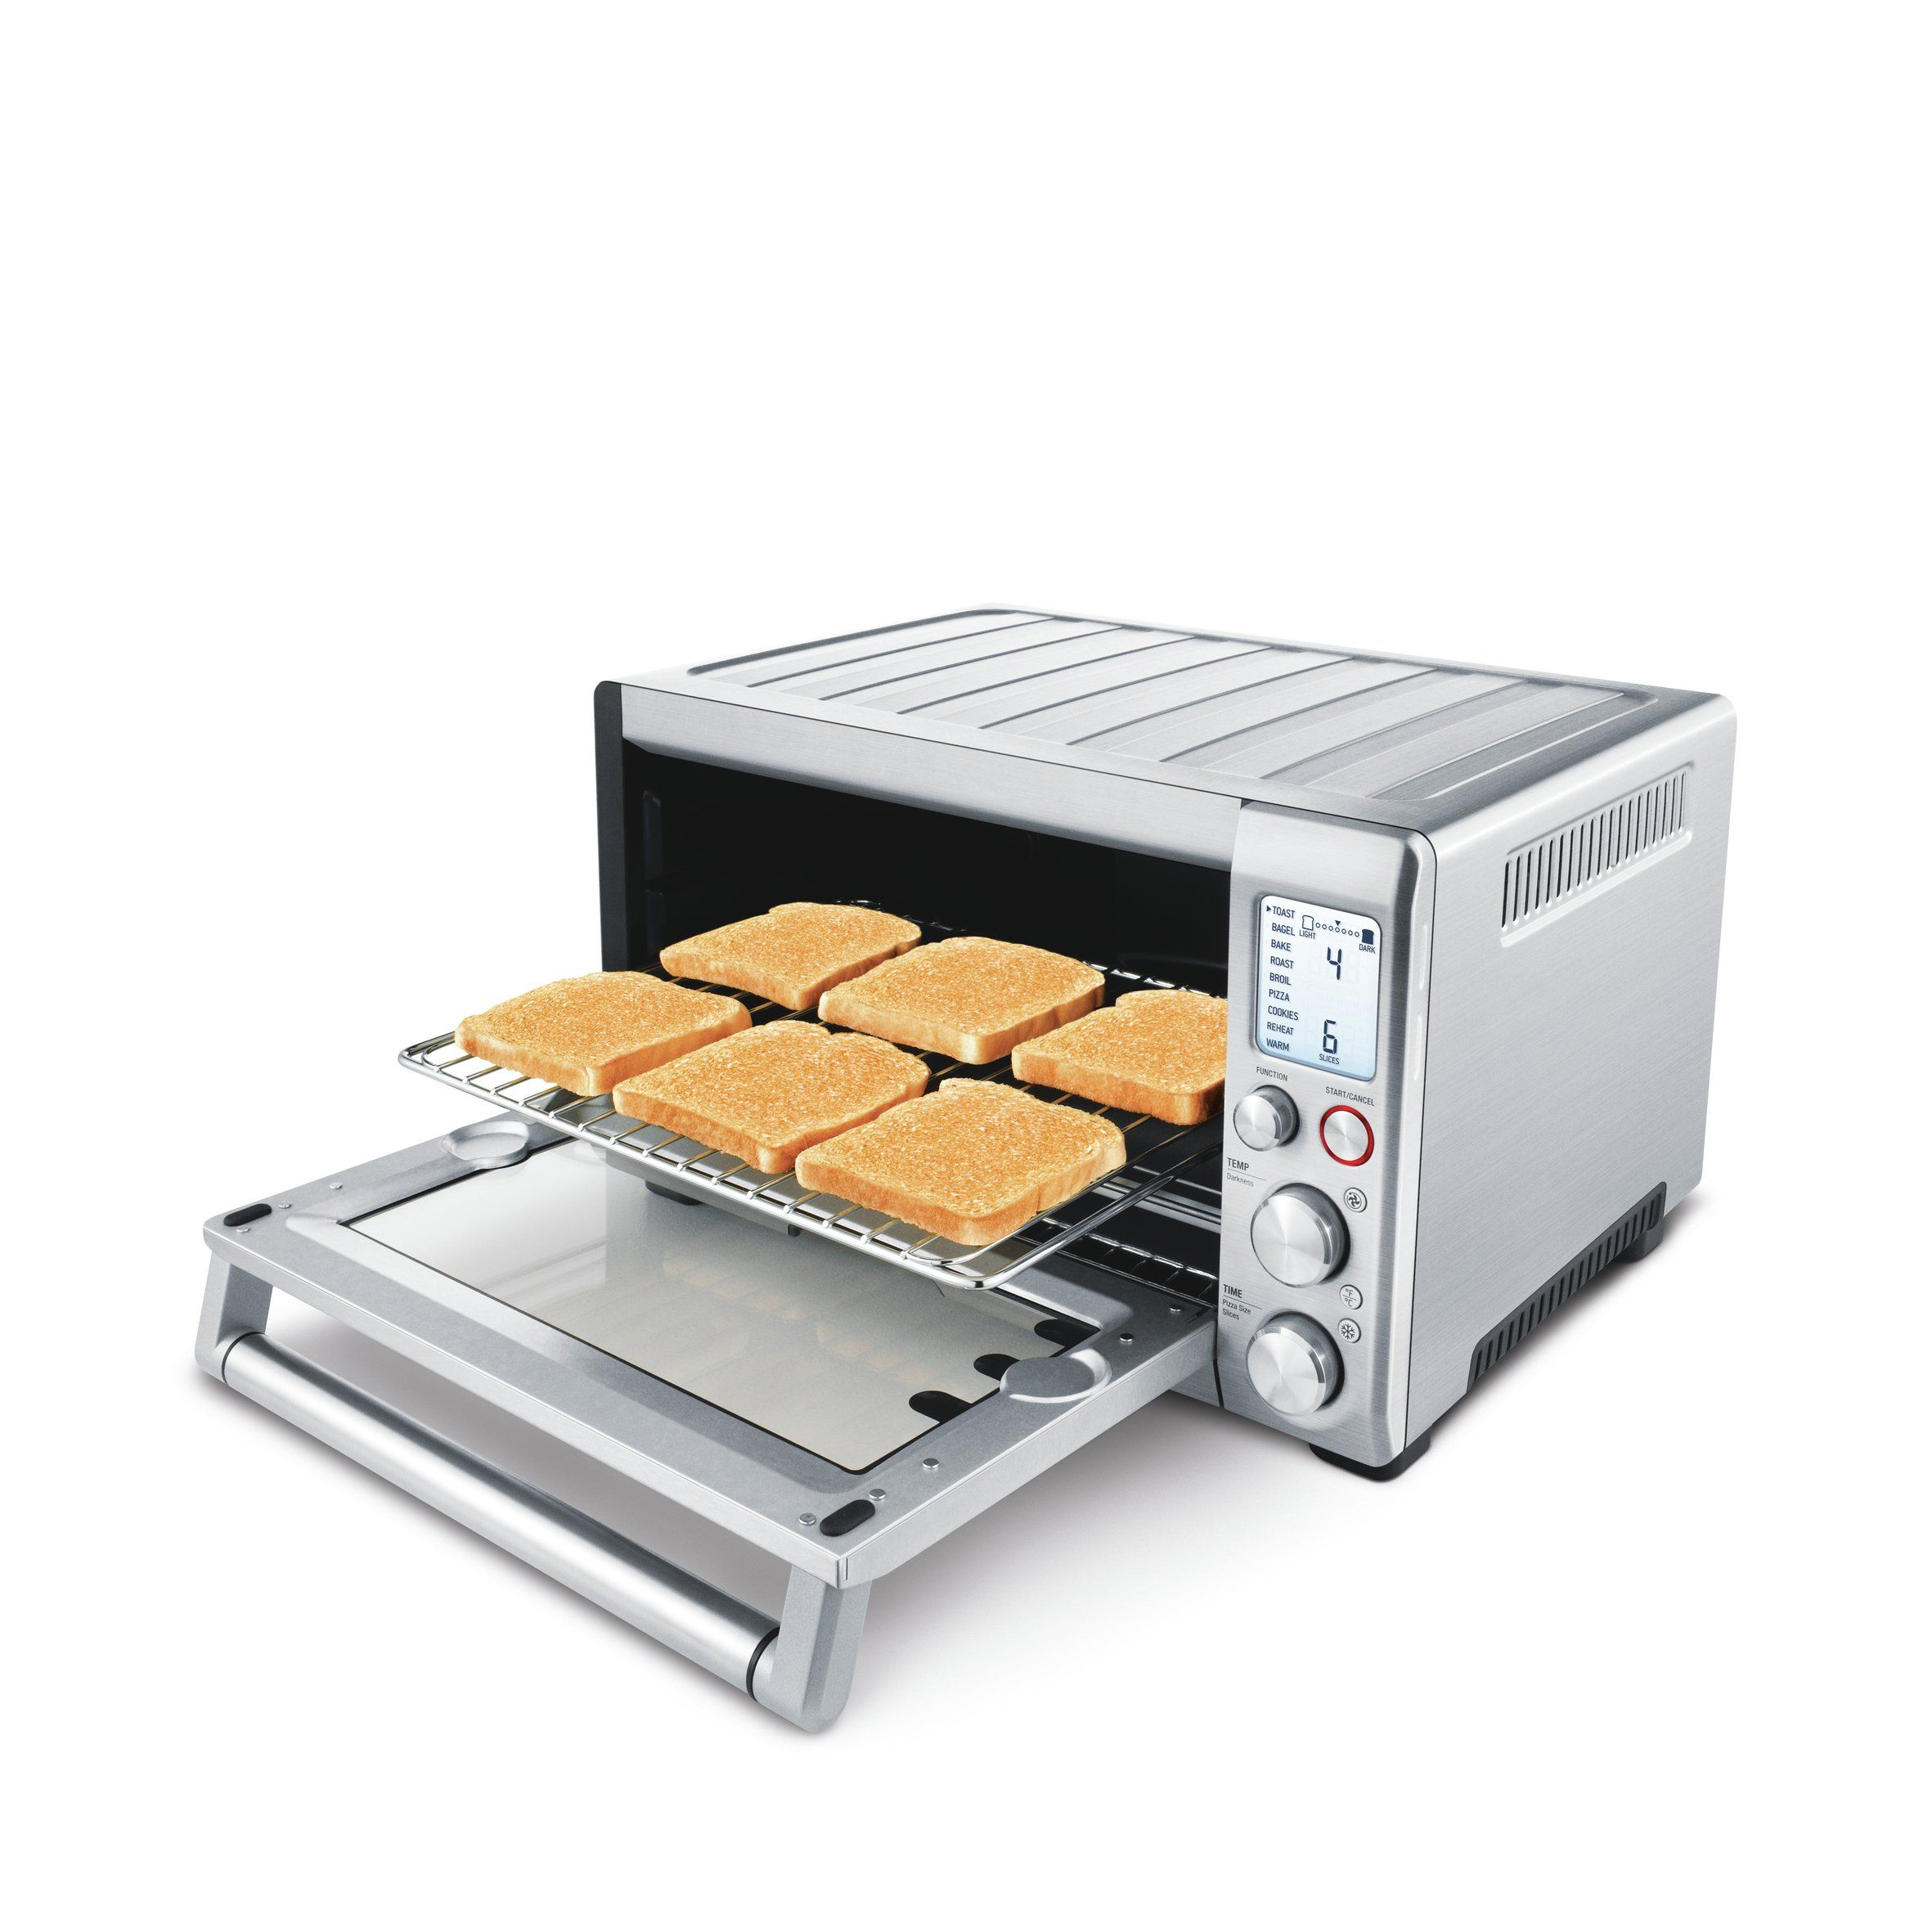 Breville Smart Oven Bov800xl Pdfshare